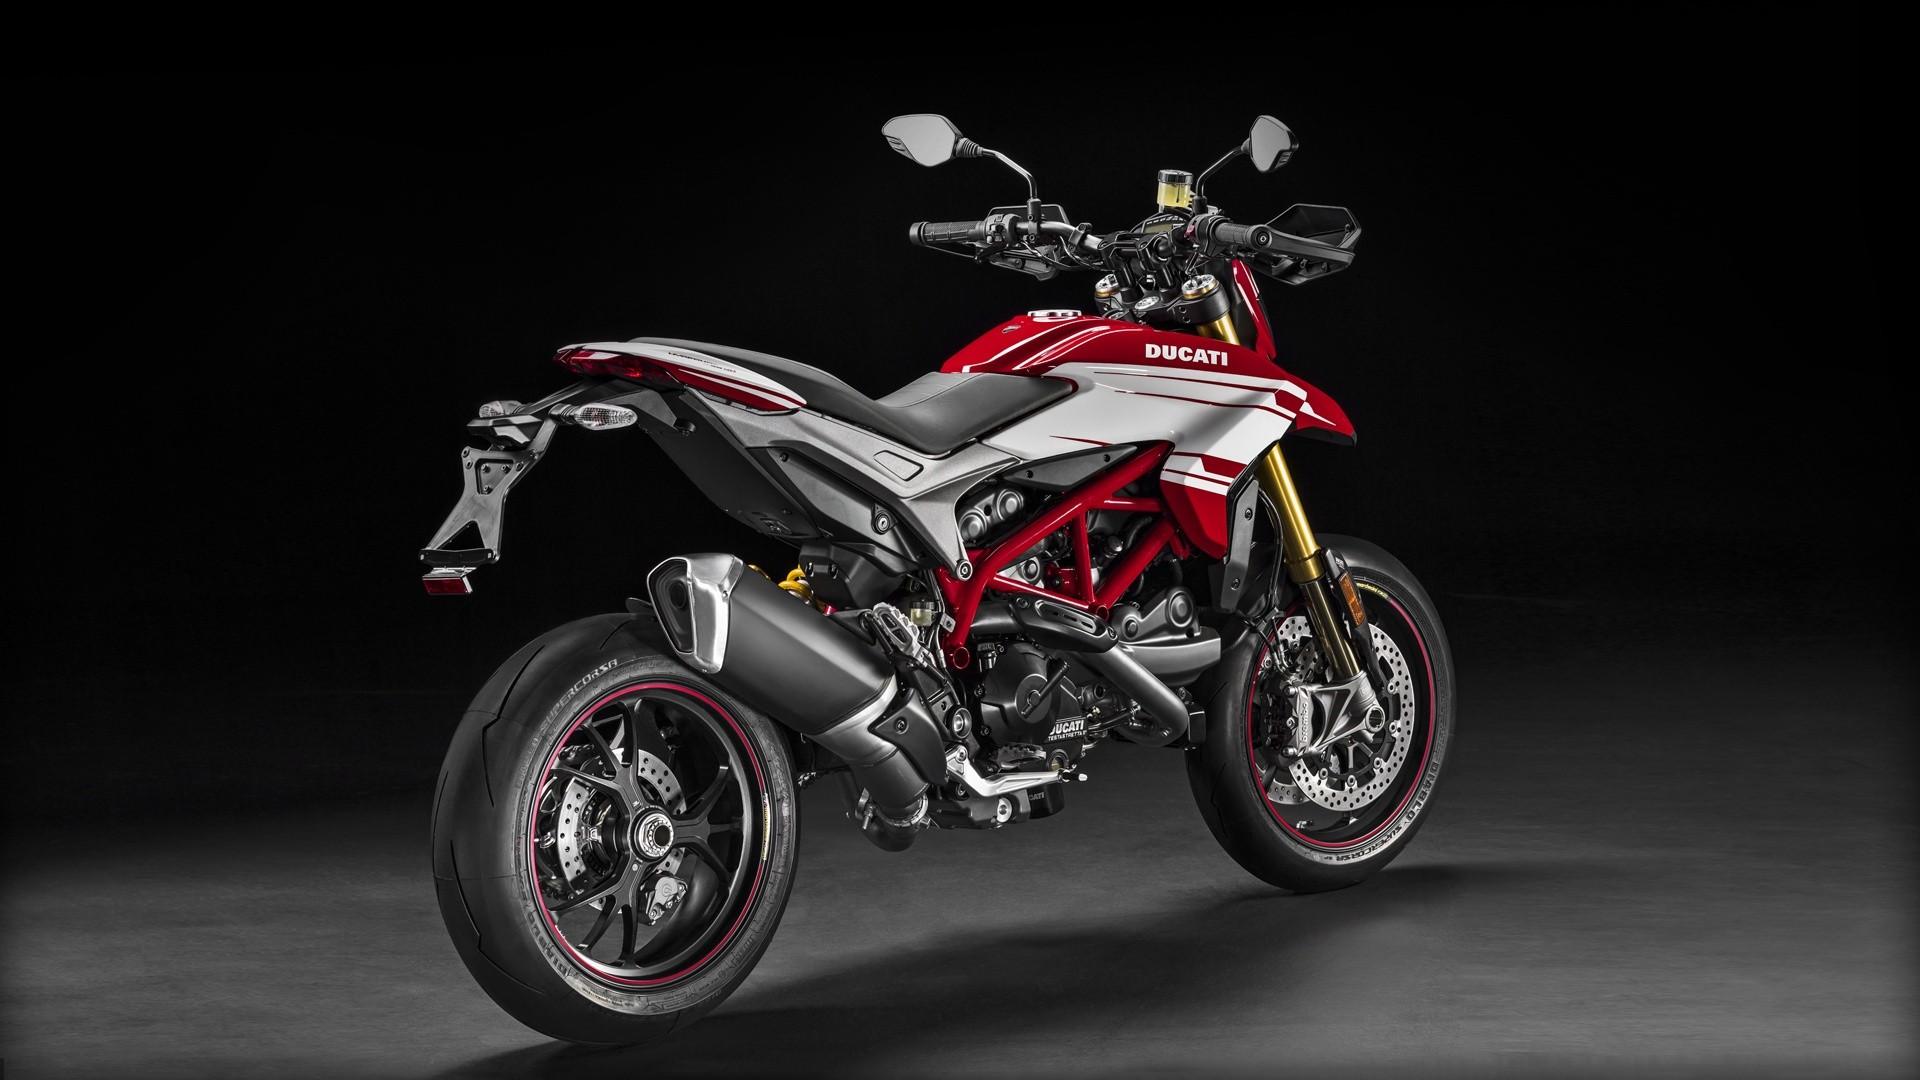 Ducati Panigale 1299 >> DUCATI Hypermotard 939 SP - 2015, 2016 - autoevolution